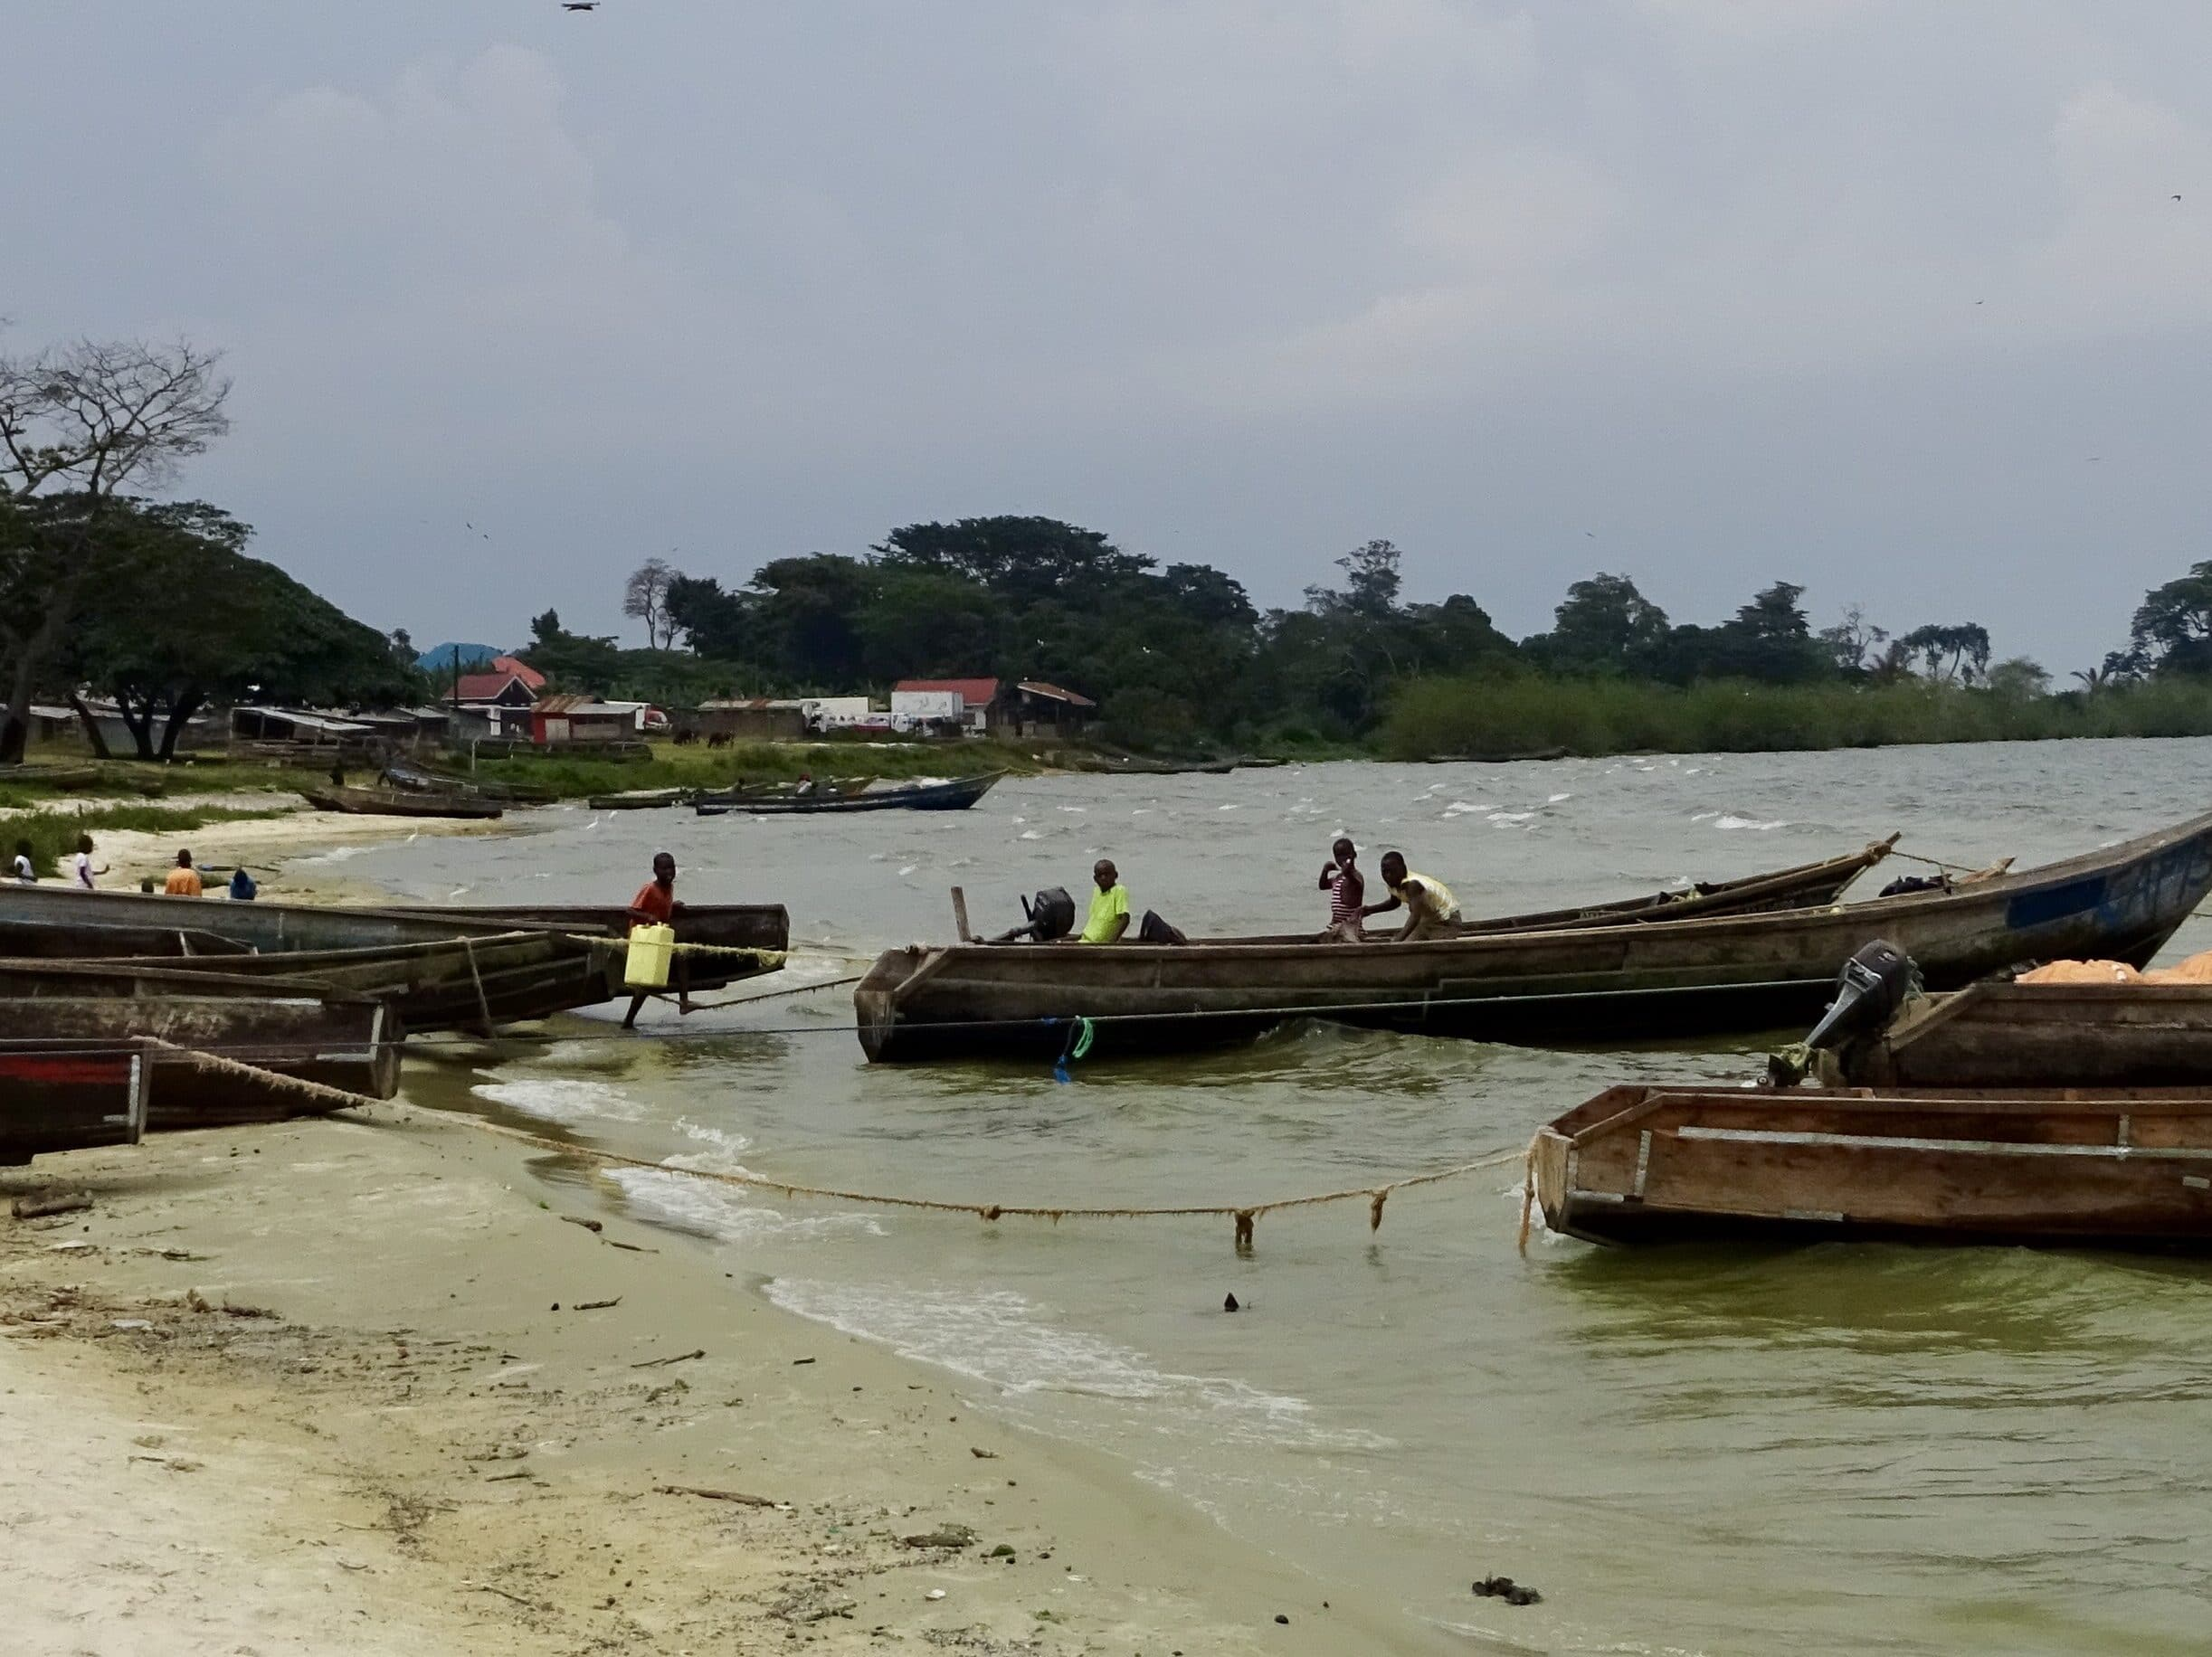 Vissers in Bube, Bugala Island